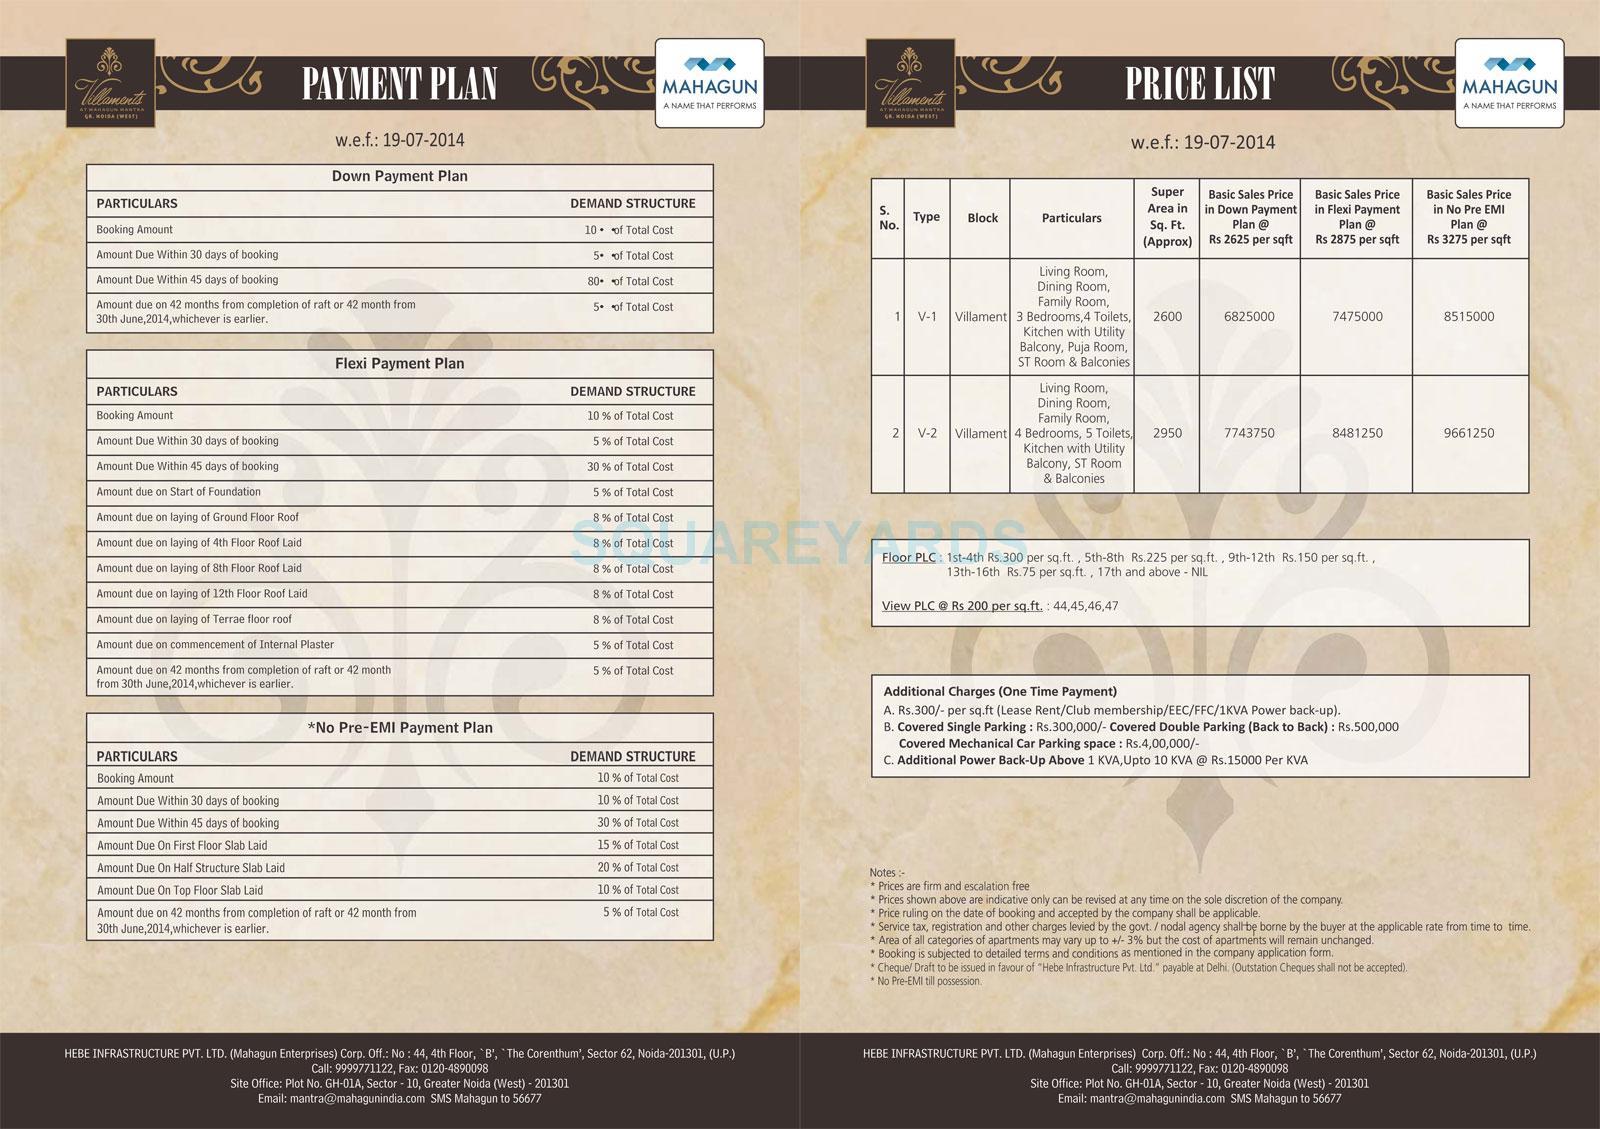 mahagun mantra ii villaments payment plan image1